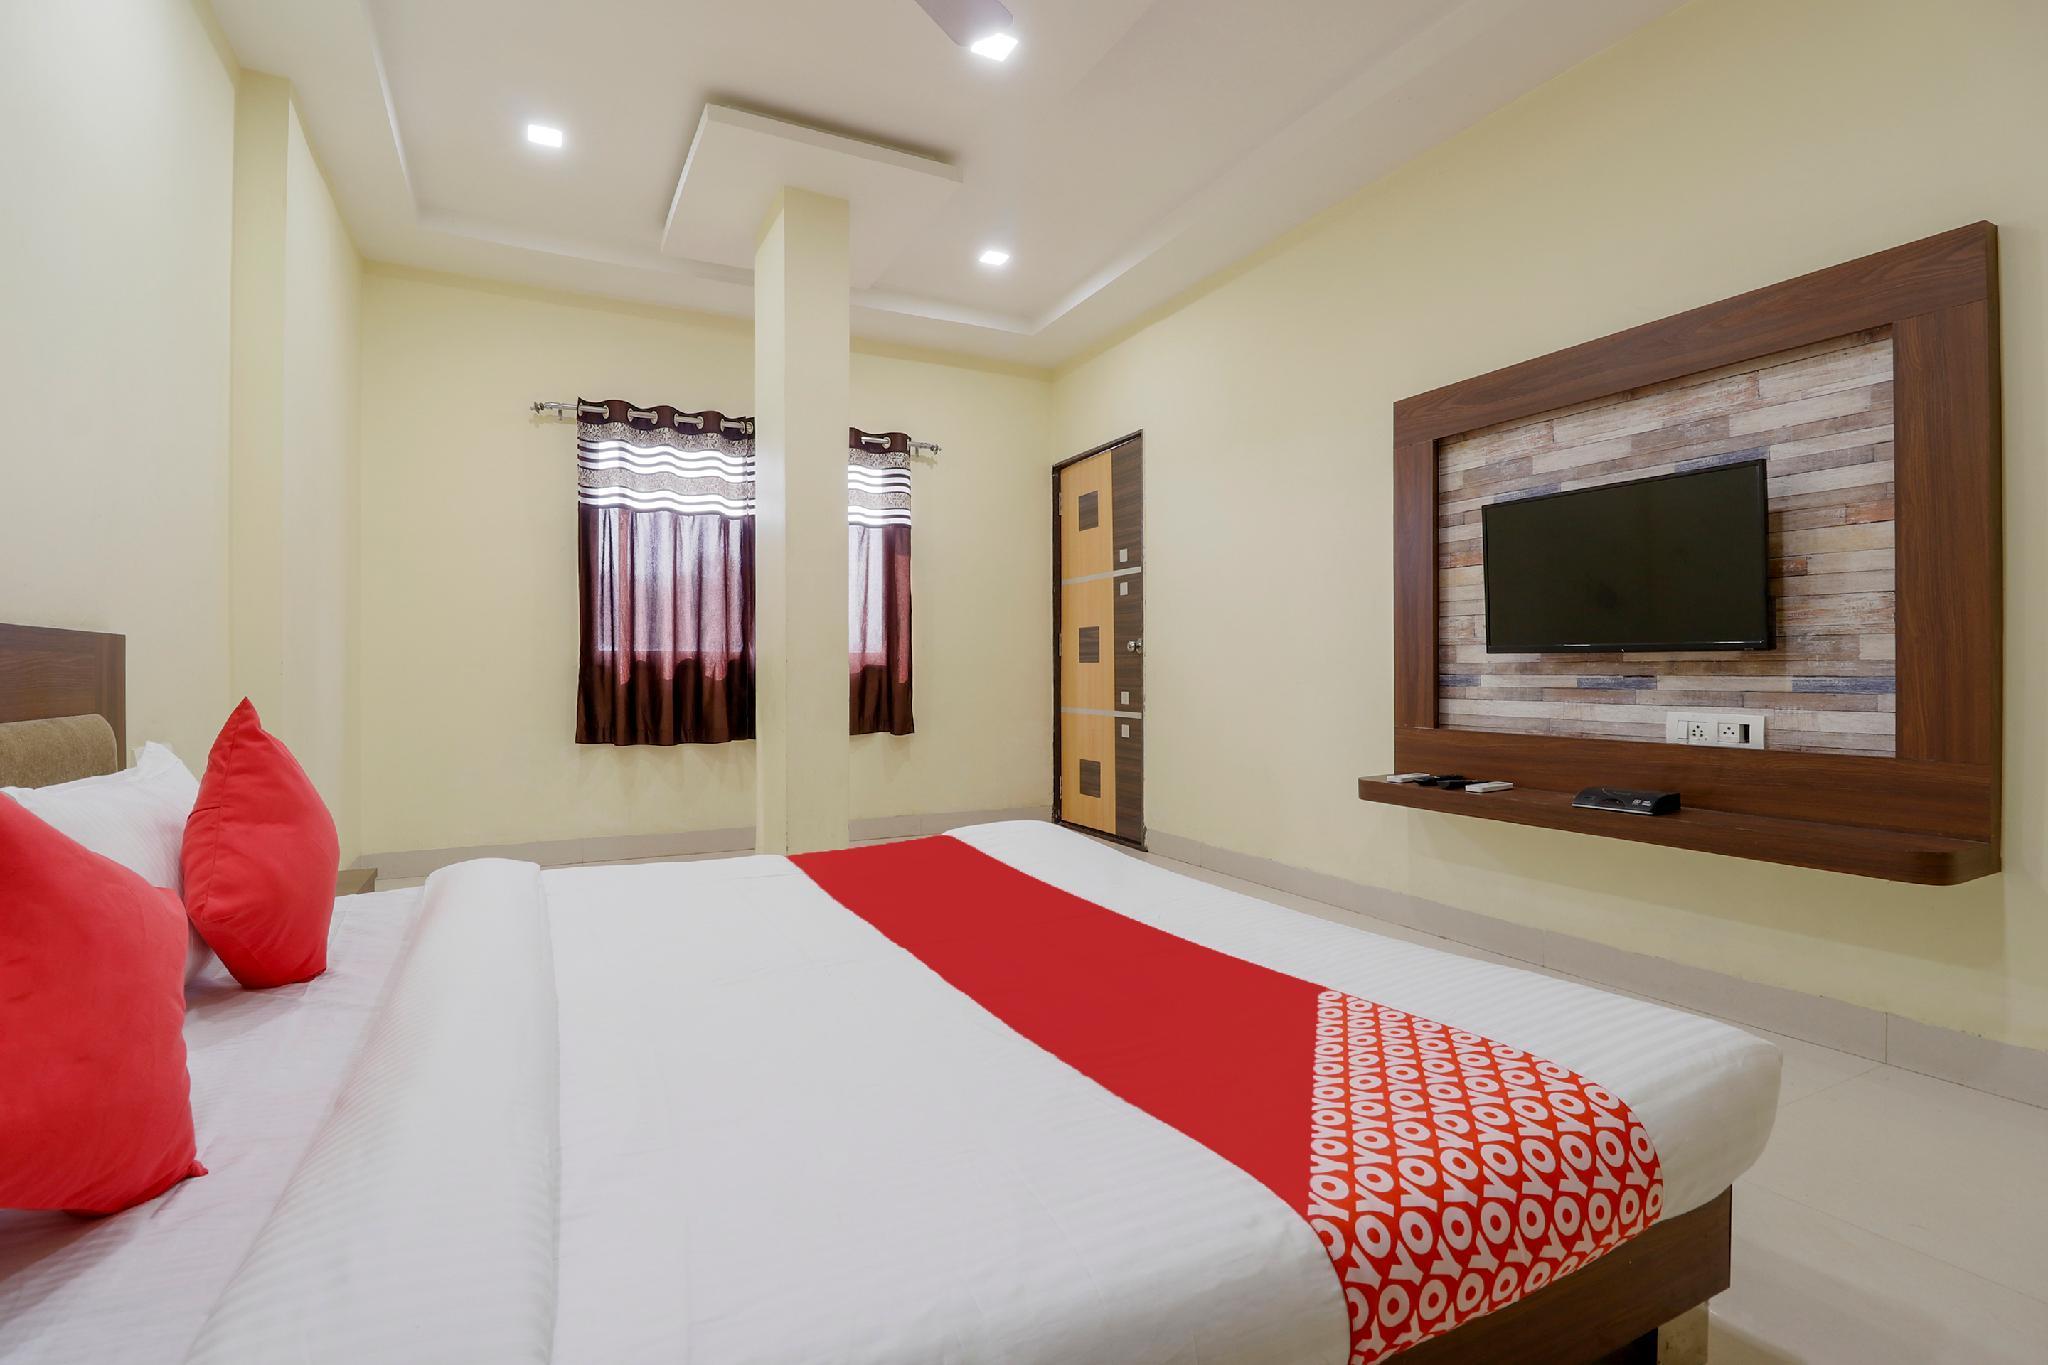 OYO 63916 Hotel Mansarover Palace